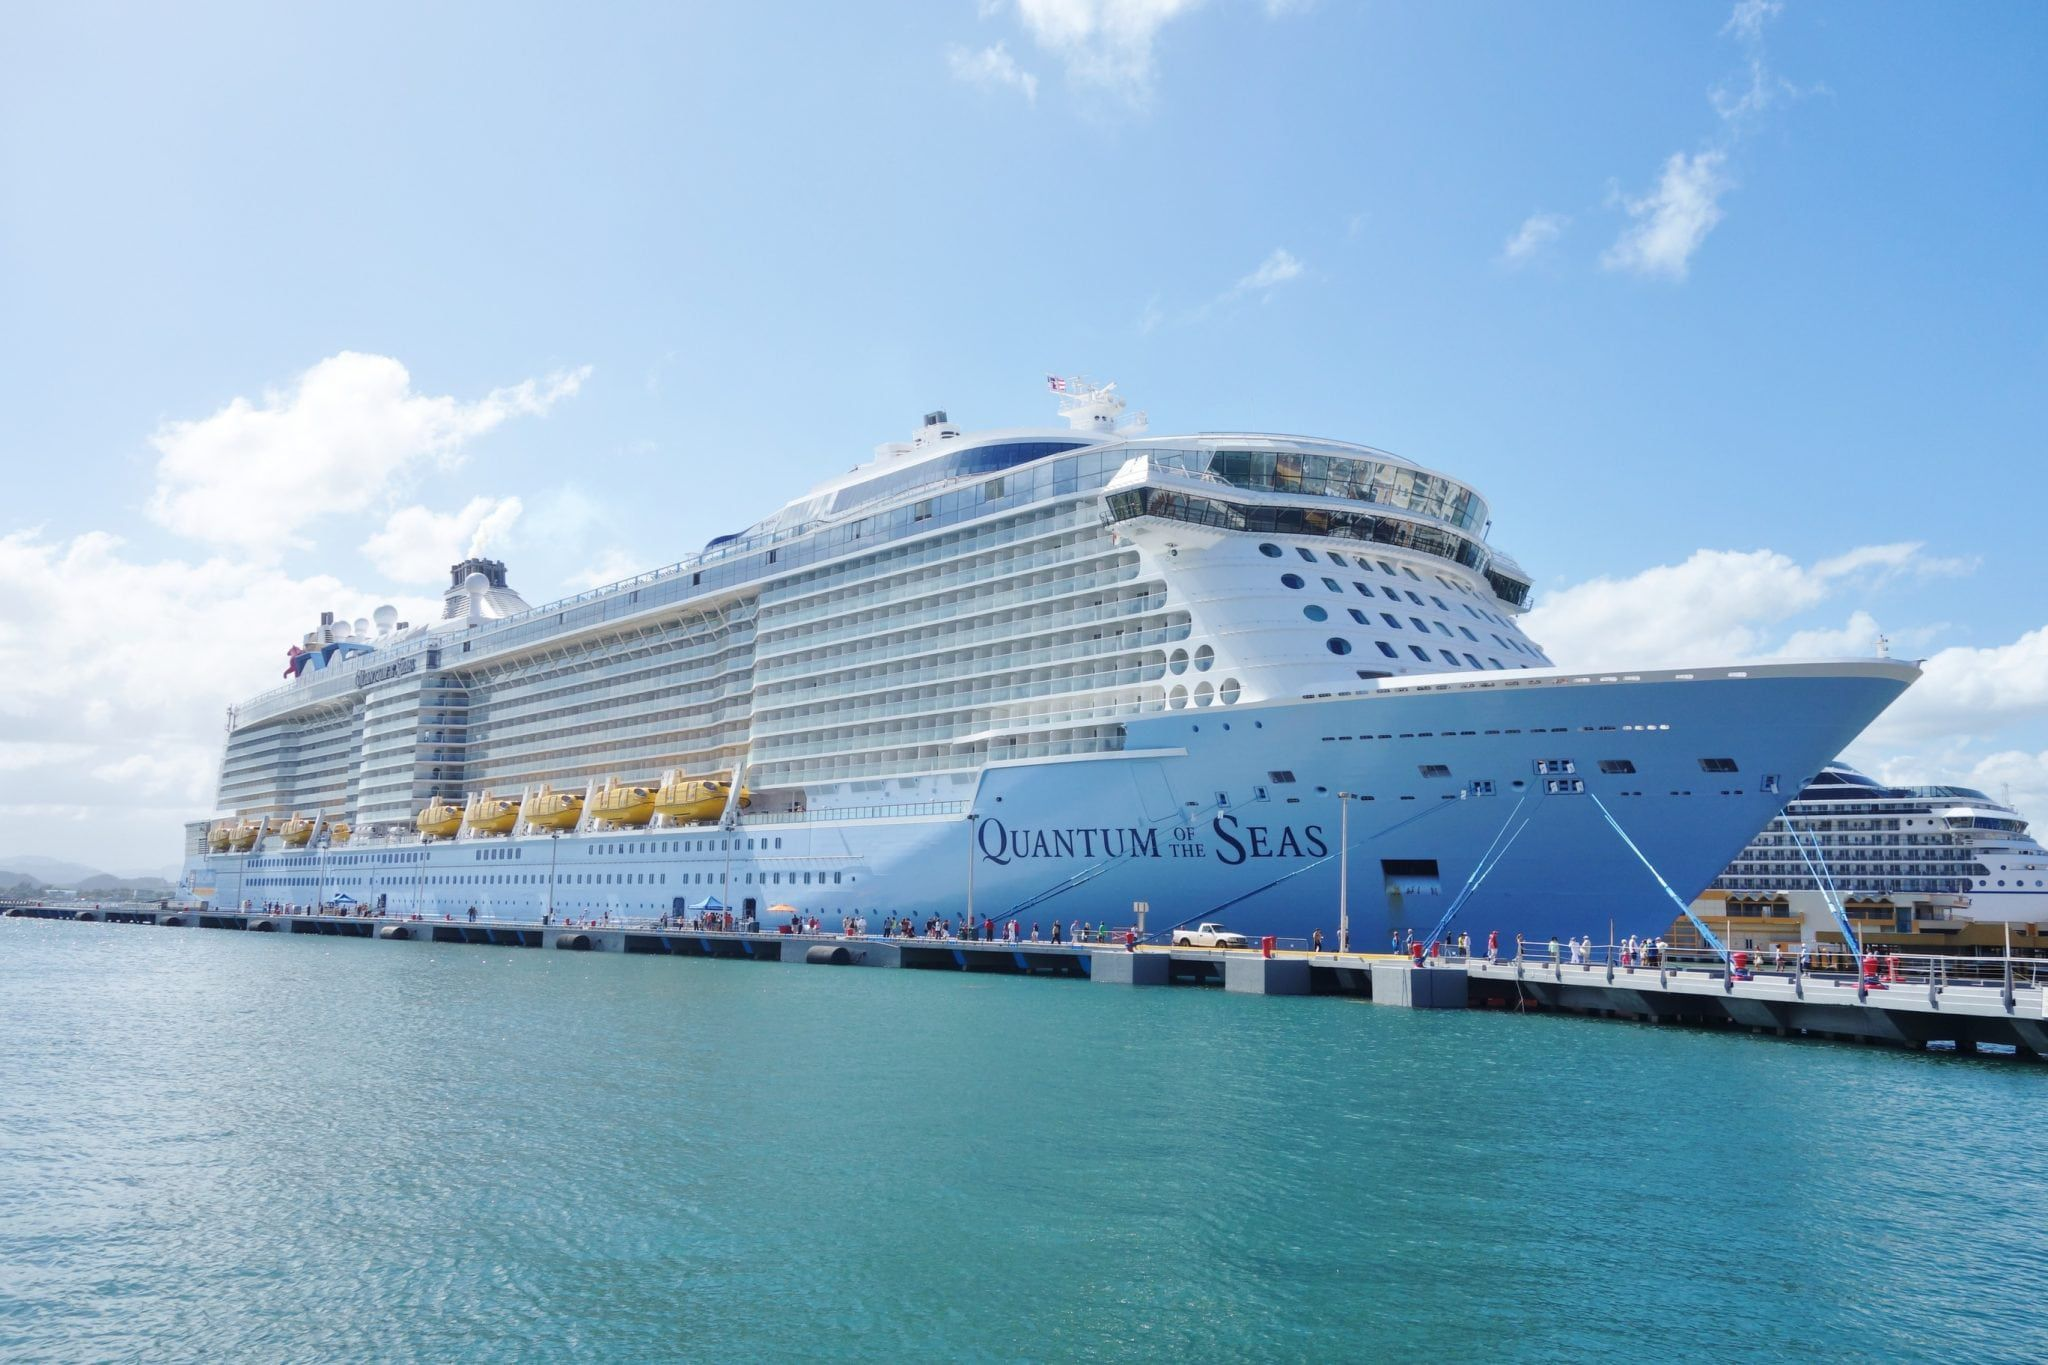 Qauntum of the Seas